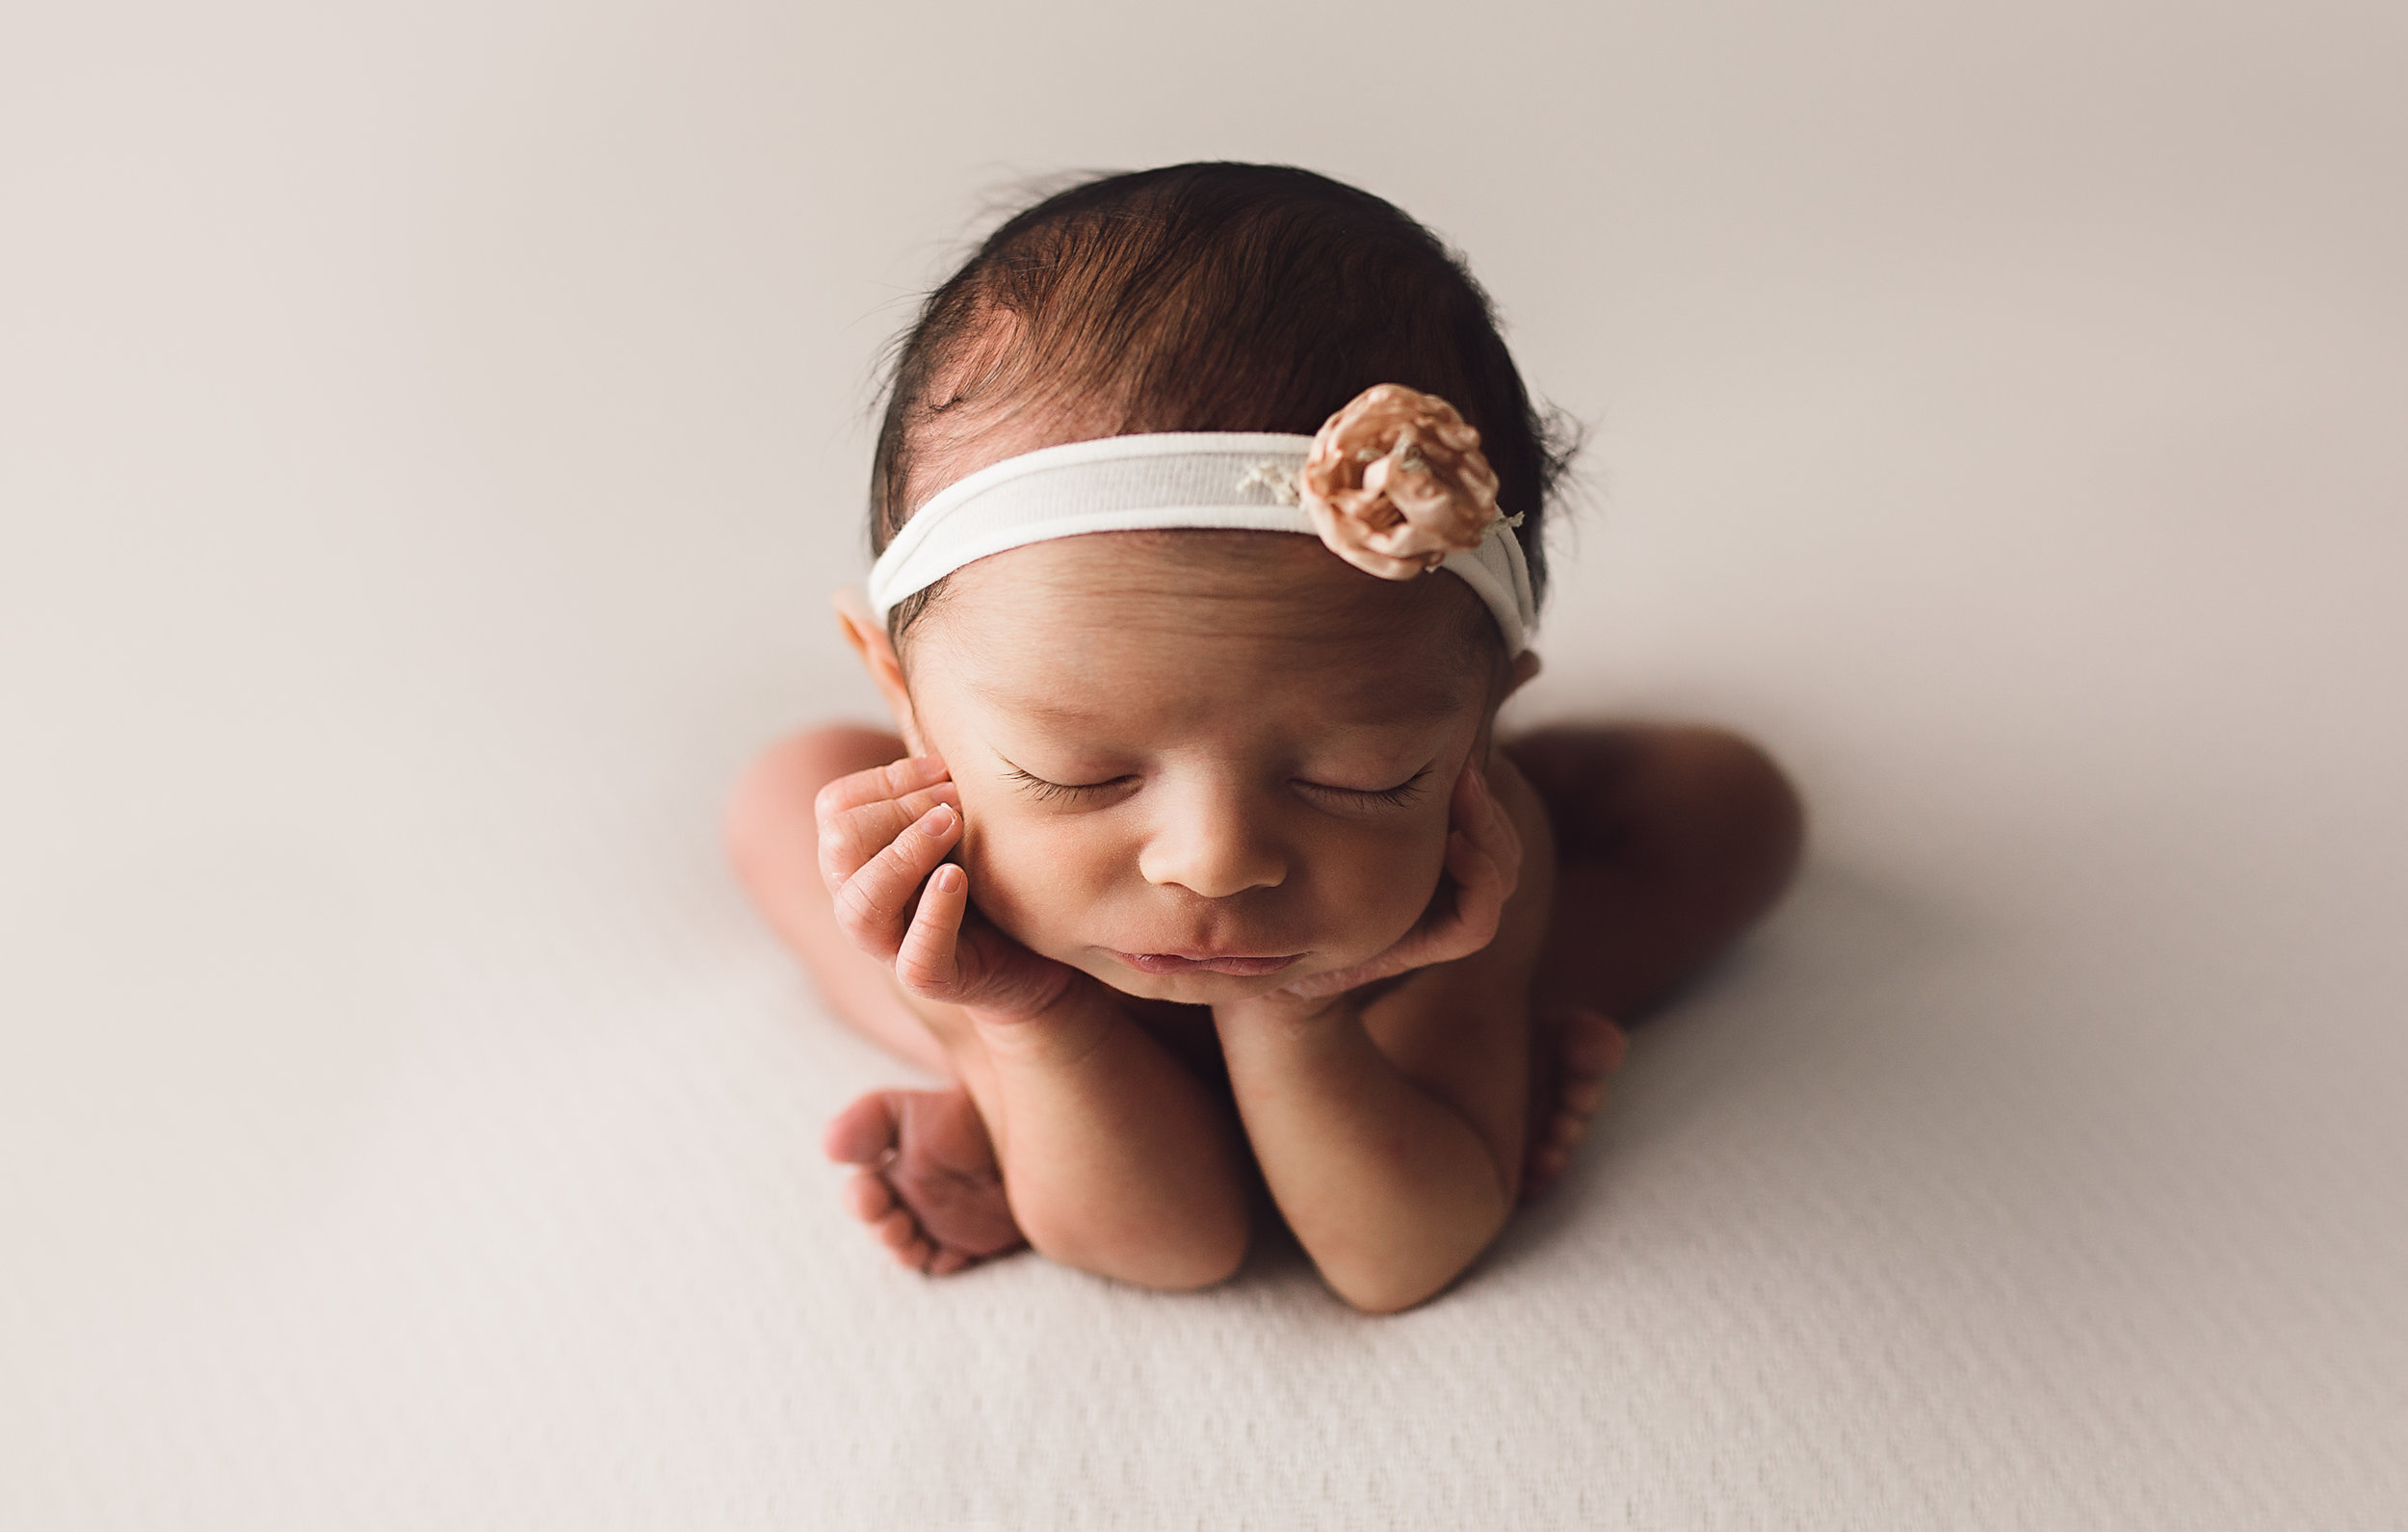 Essex-county-newborn-photographer-froggy-pose-baby-headband-white-girl